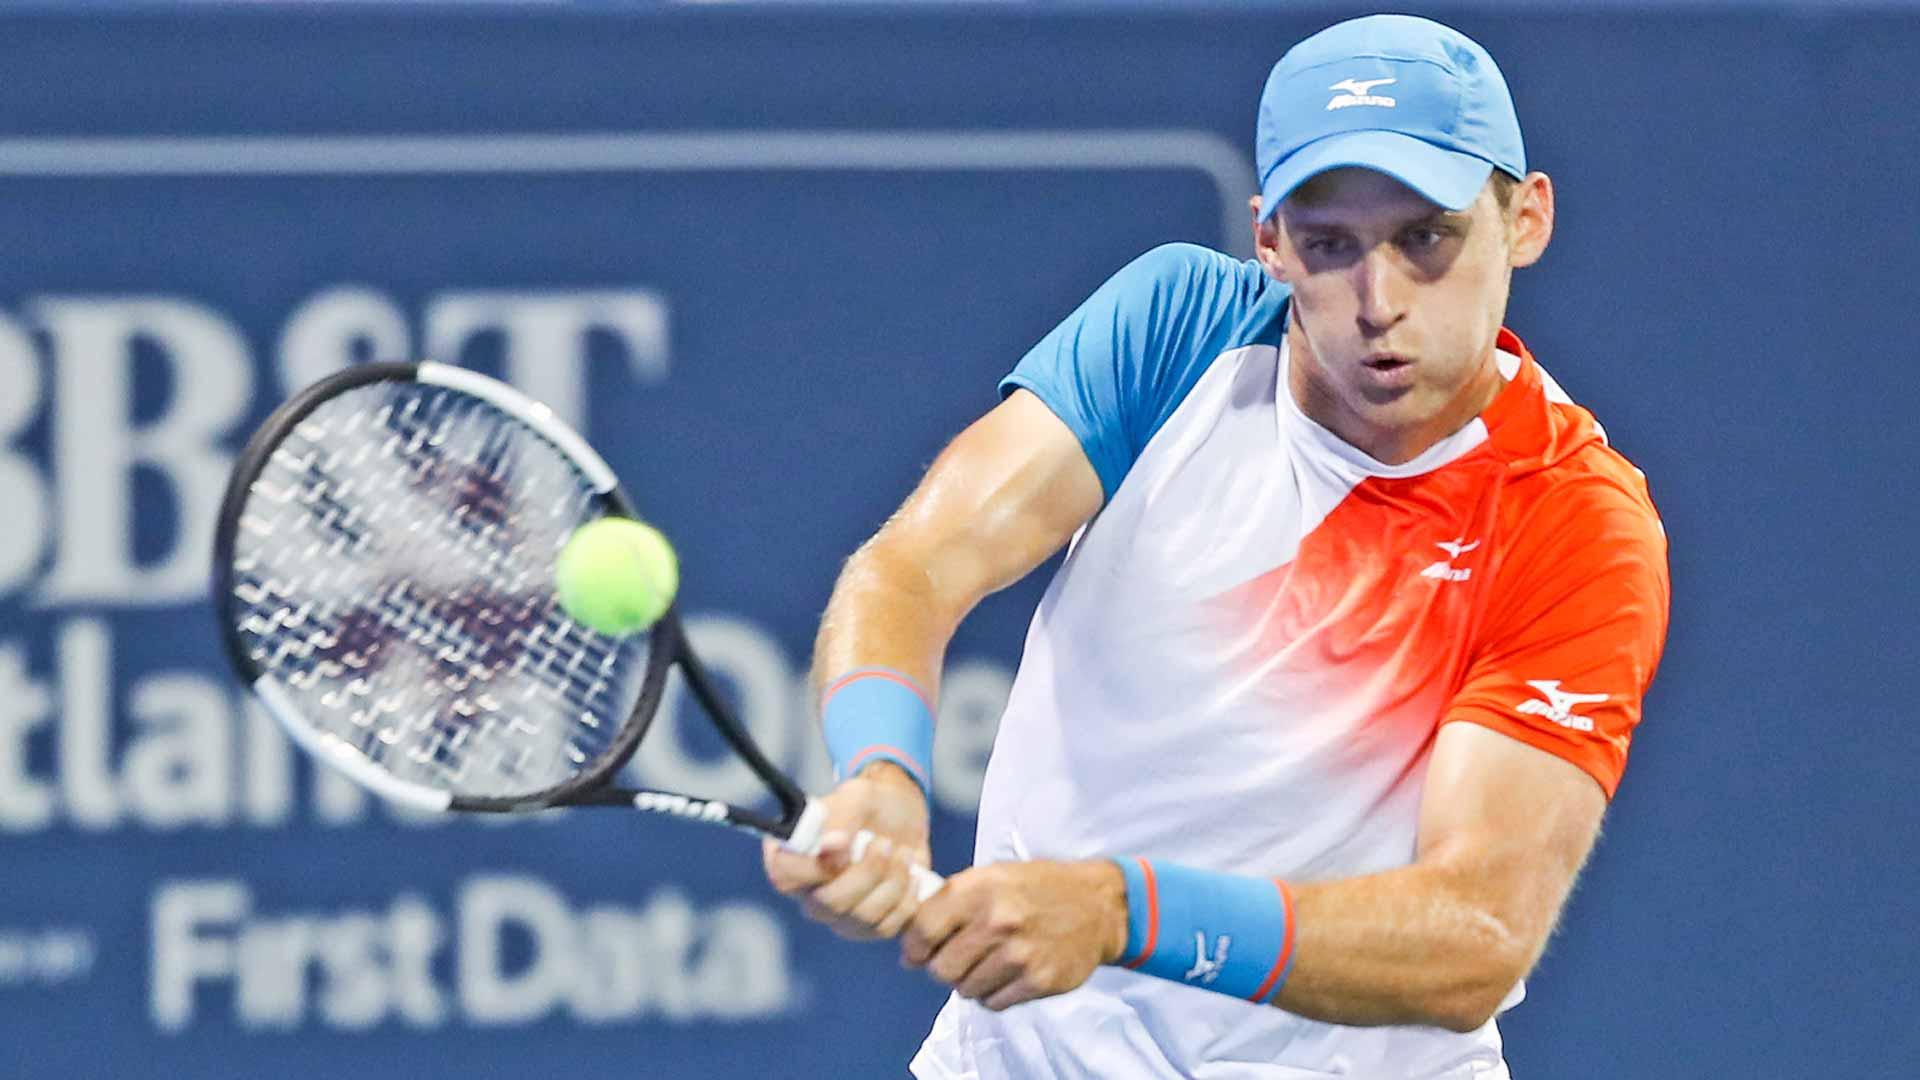 Атланта. Теннисист из пятой сотни рейтинга обыграл Димитрова, Сок и Тиафо проиграли на старте